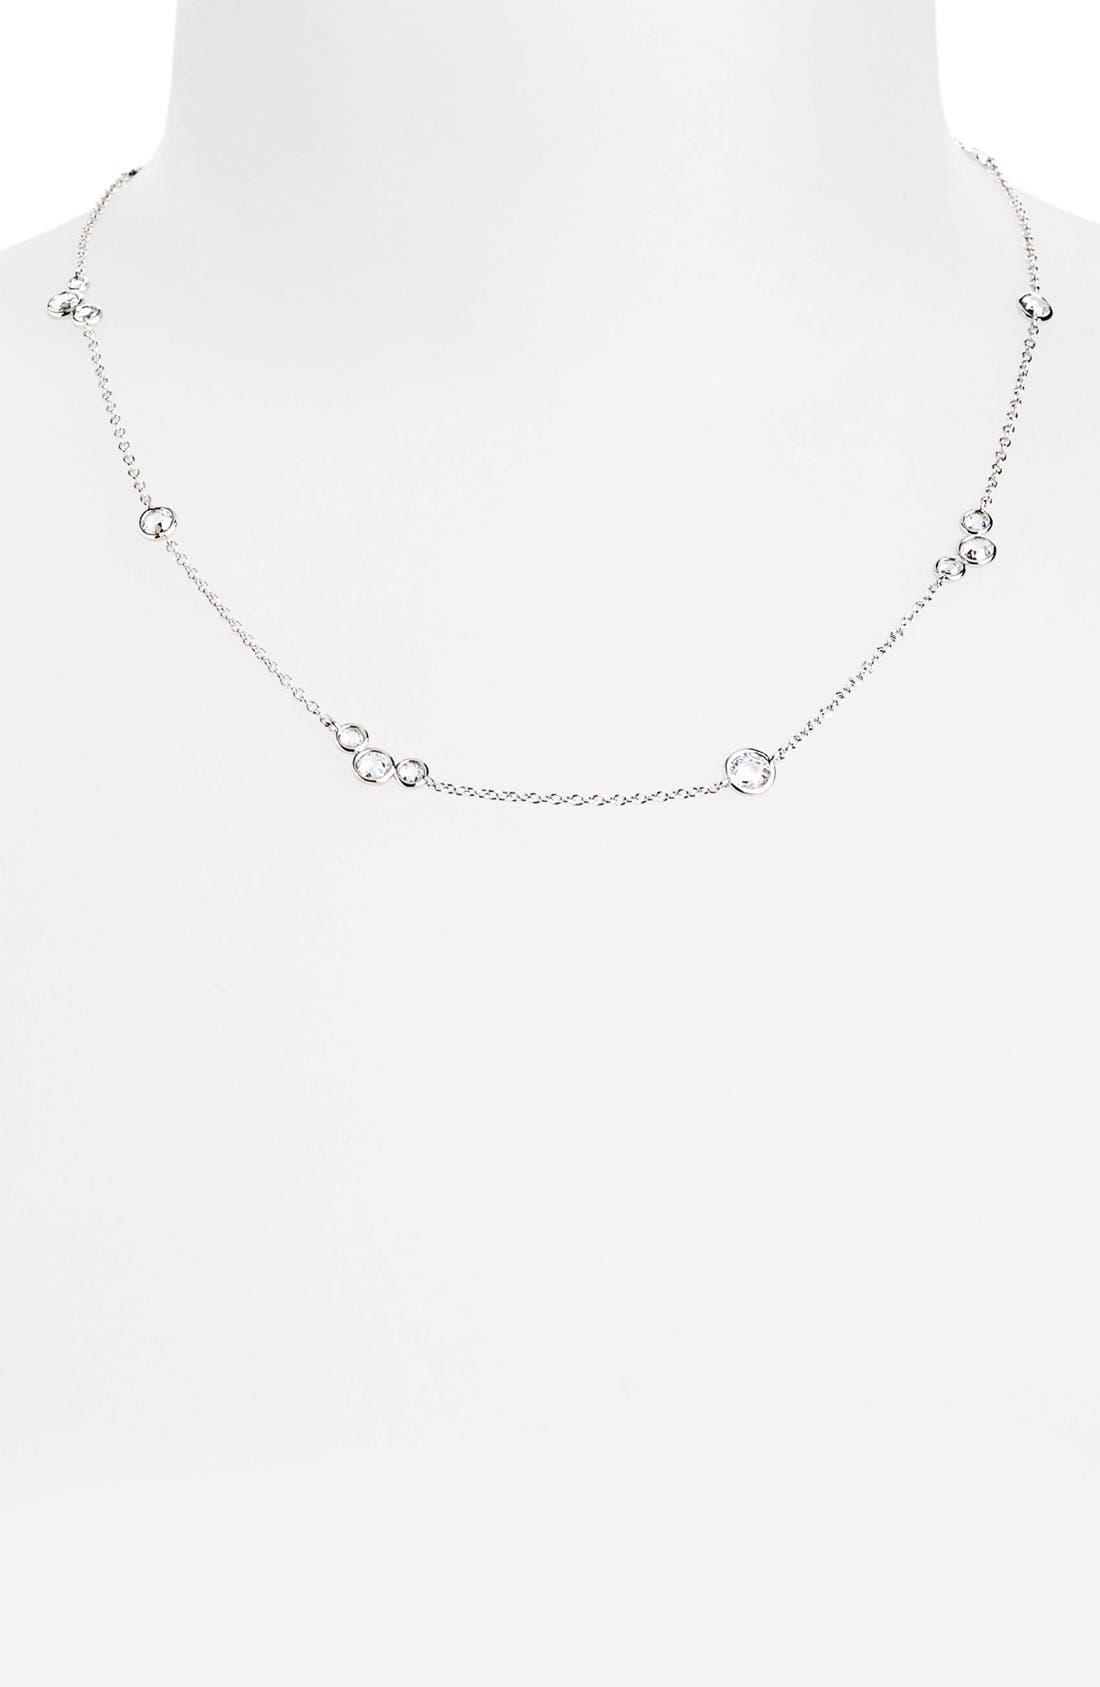 Alternate Image 1 Selected - Nadri 'Dewdrop' Station Collar Necklace